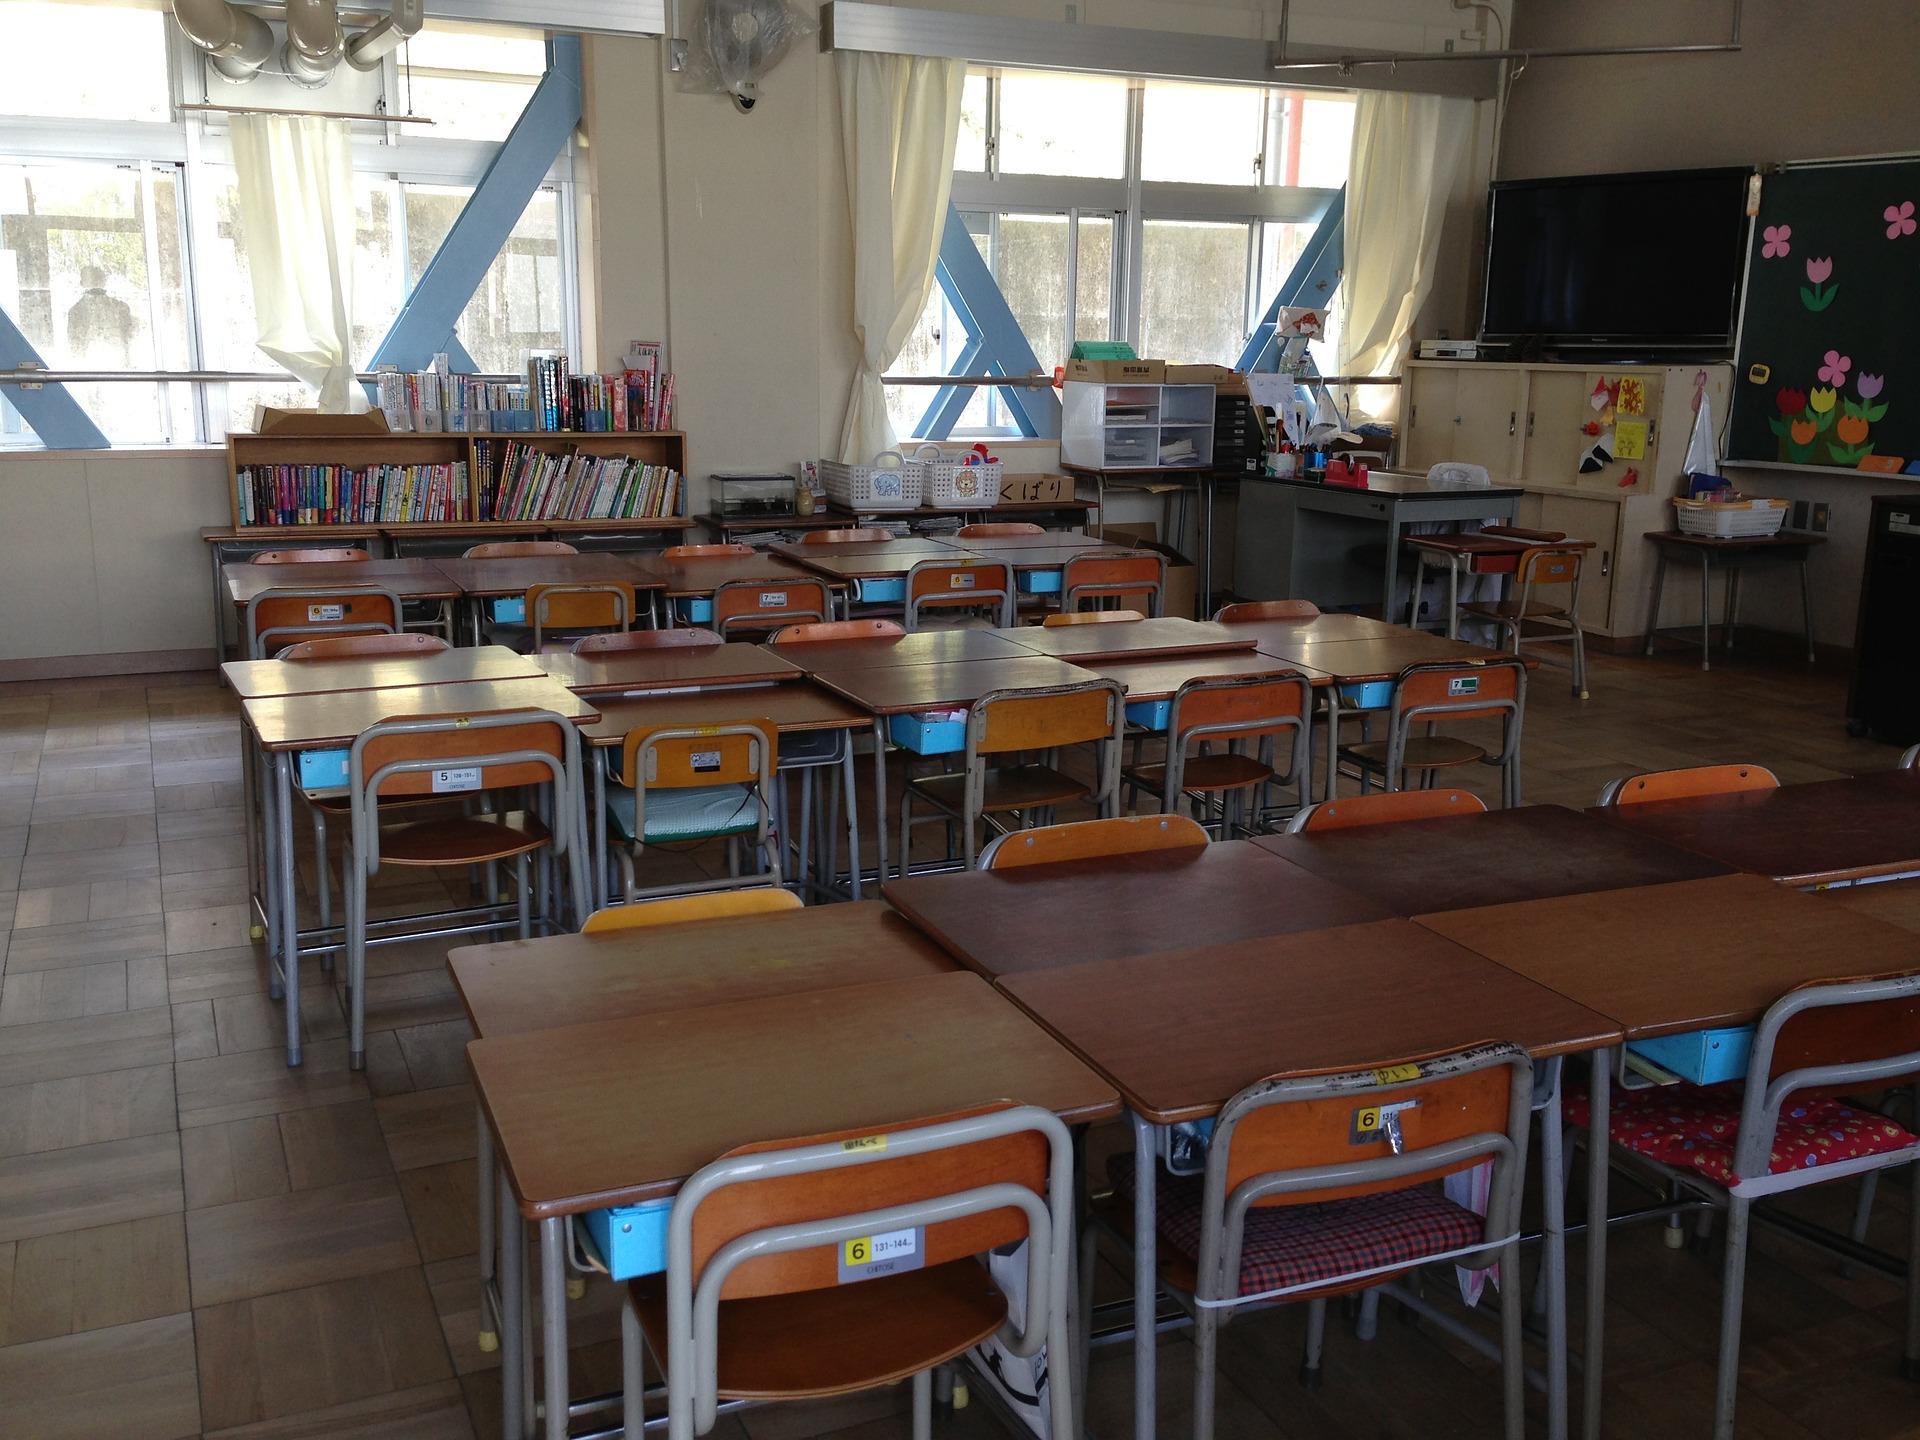 japan-classroom-school-960260-Pixabay